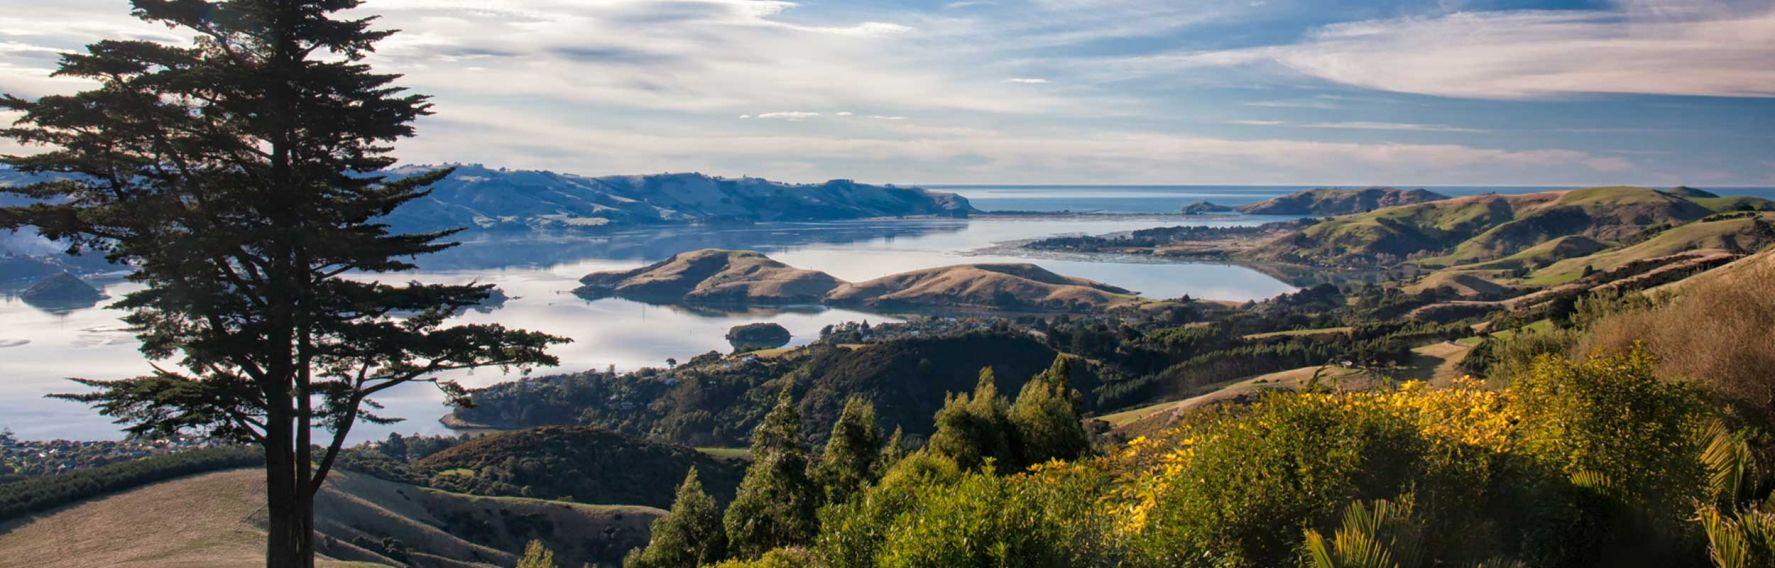 Otago Peninsula scenic shot